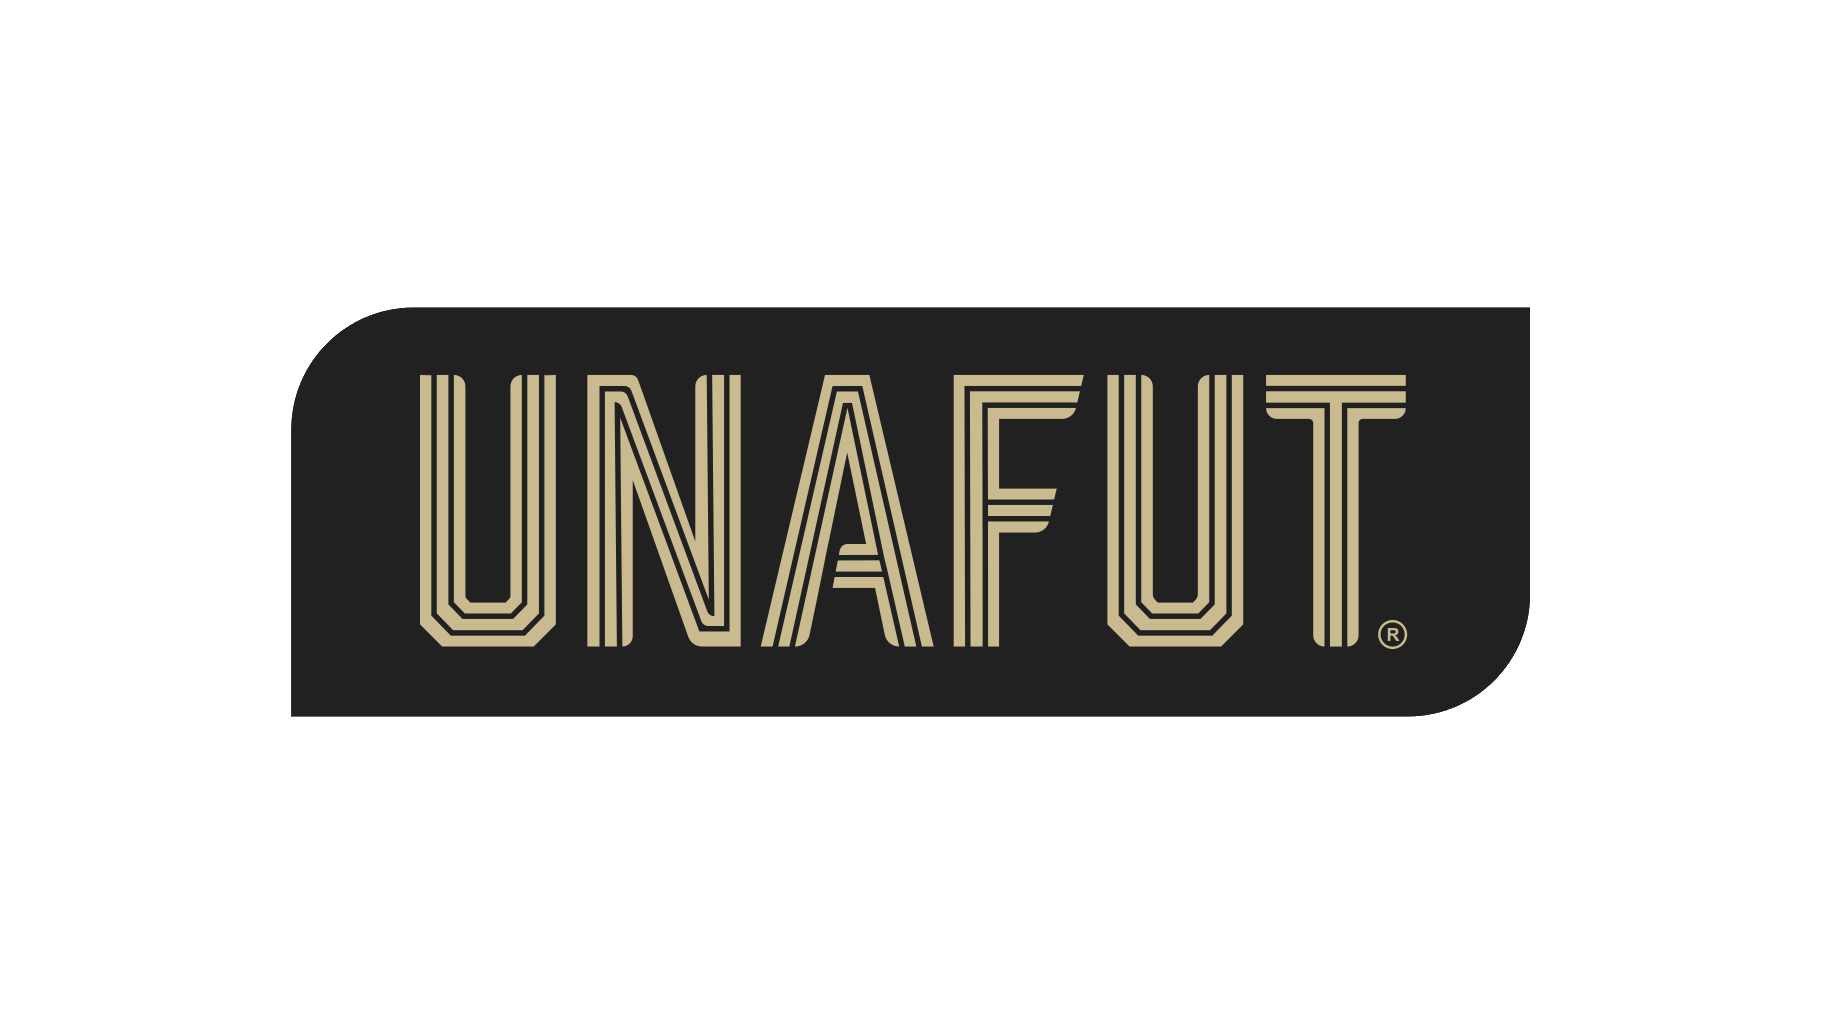 Asamblea de Unafut acordó modificar normativa y calendario para poder jugar completo el Apertura 2020.